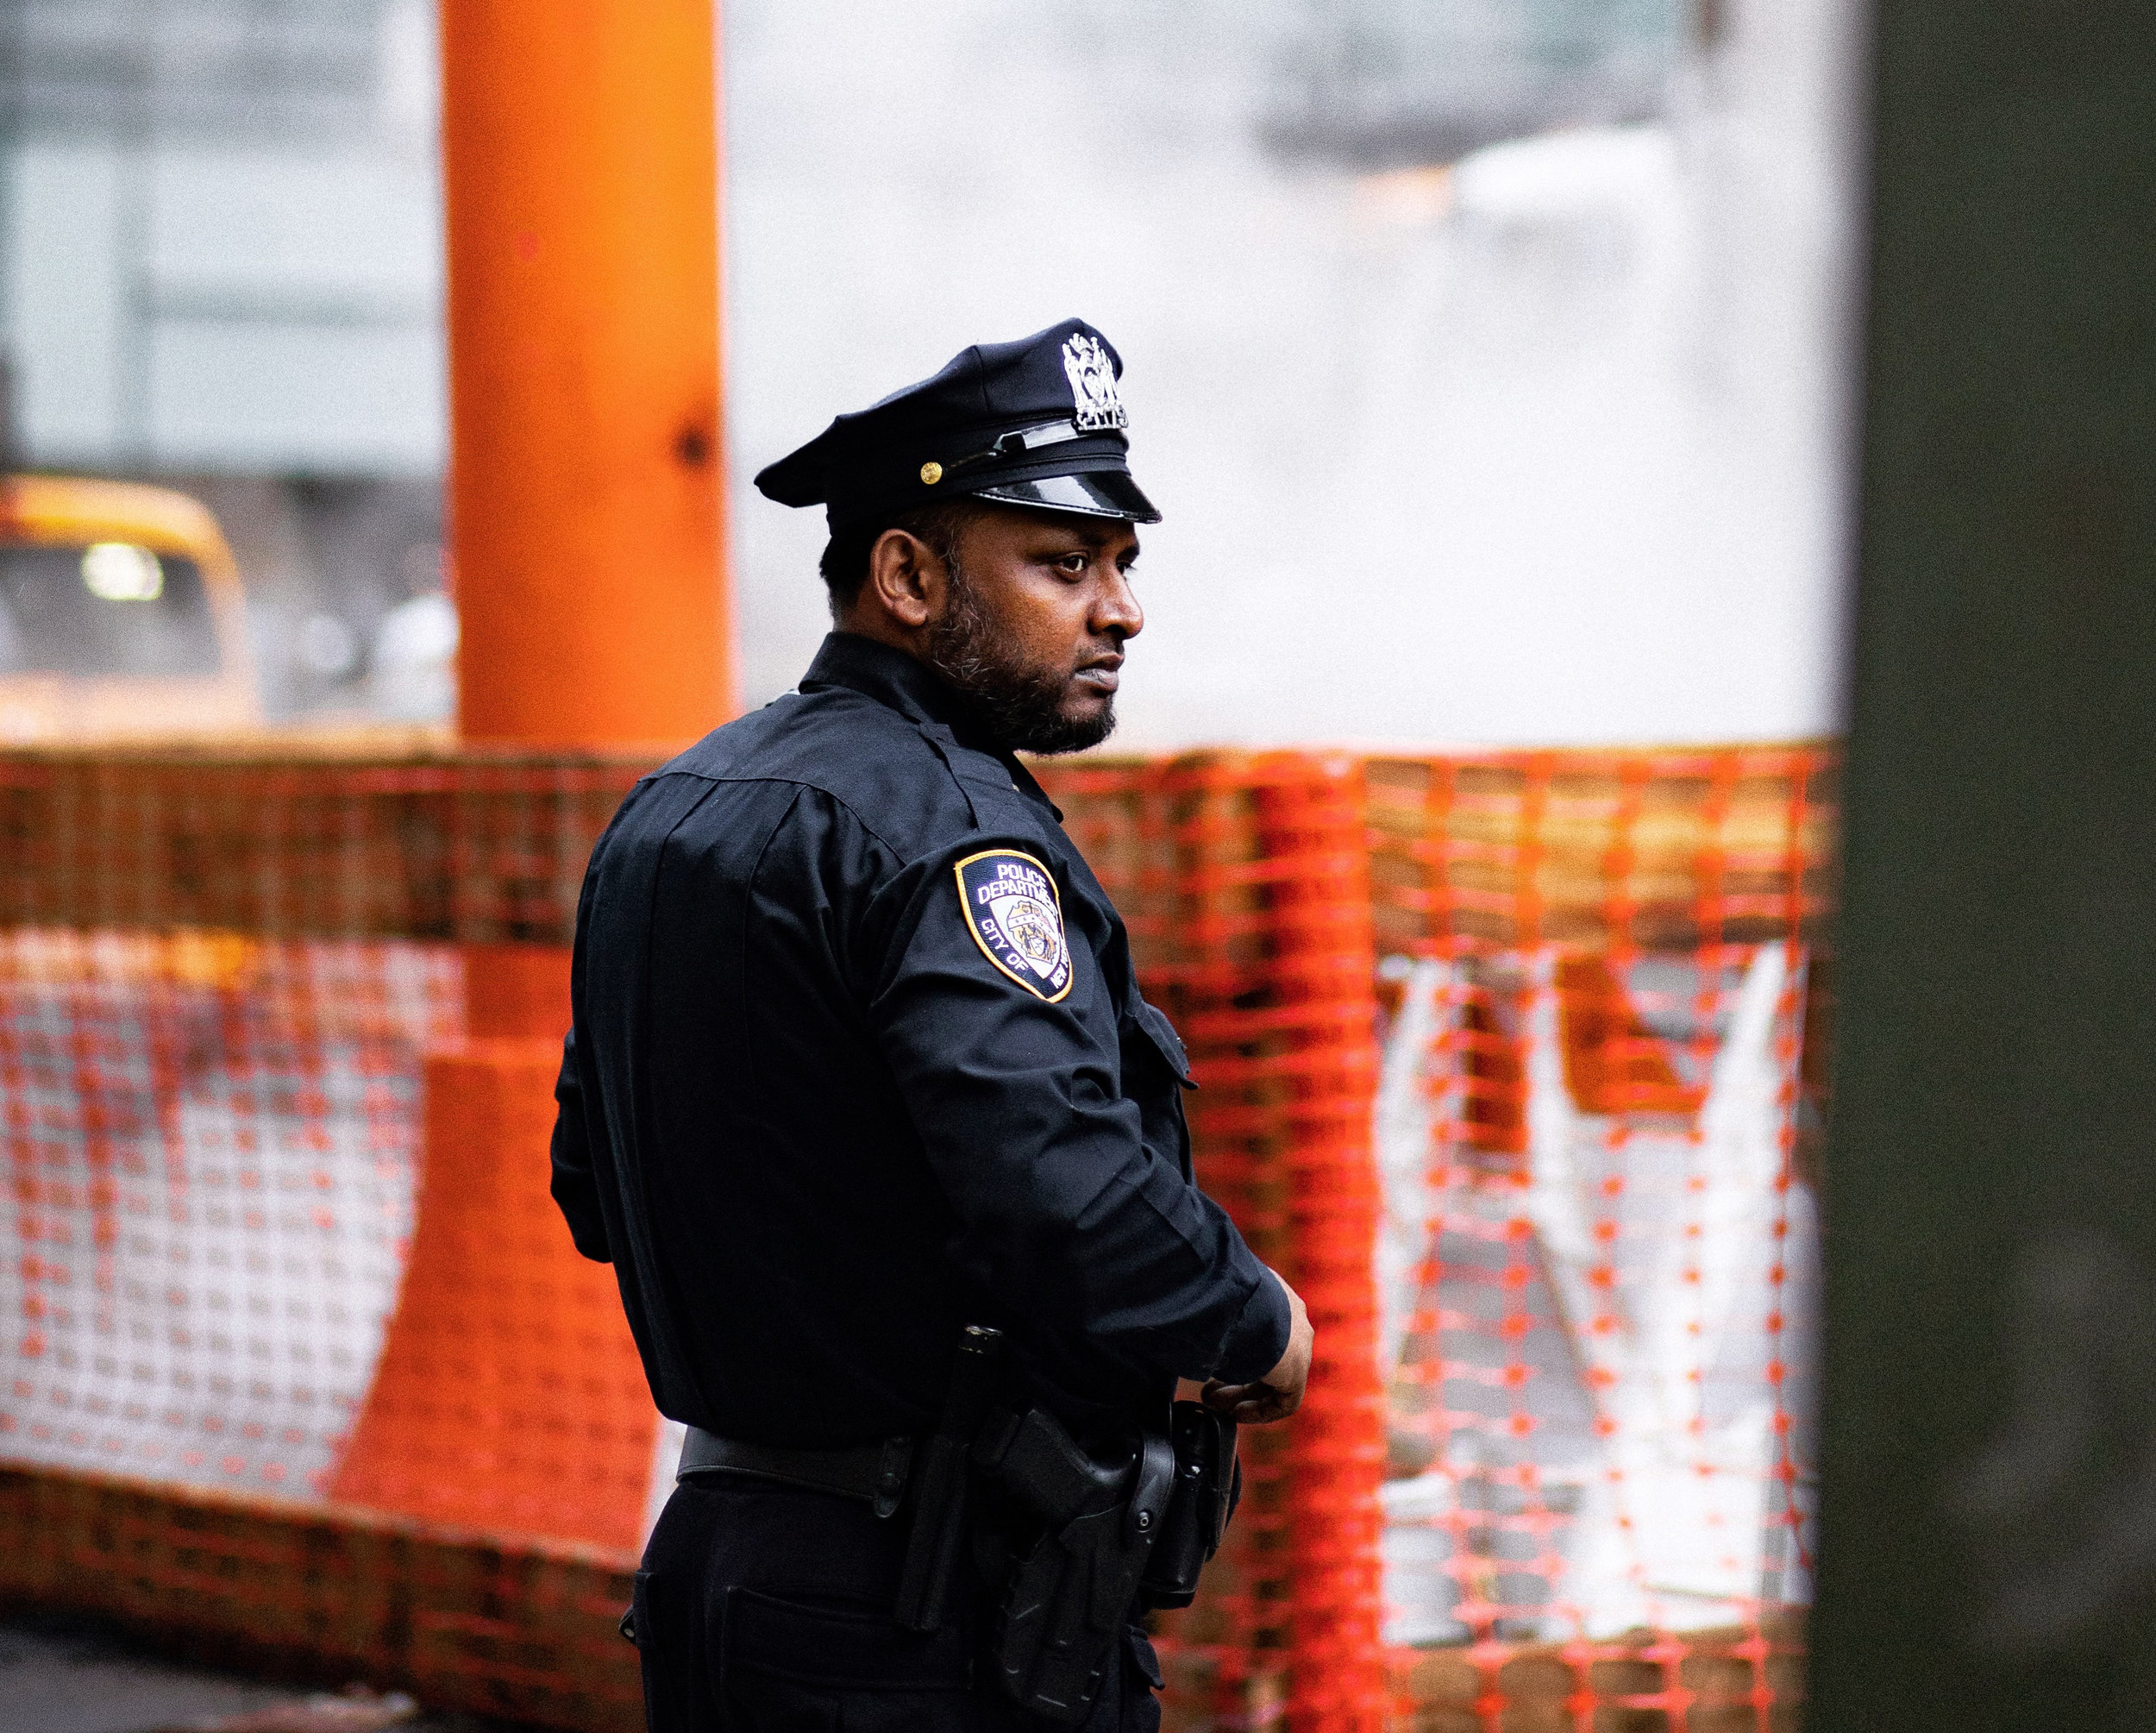 police-officer-unsplash.jpg